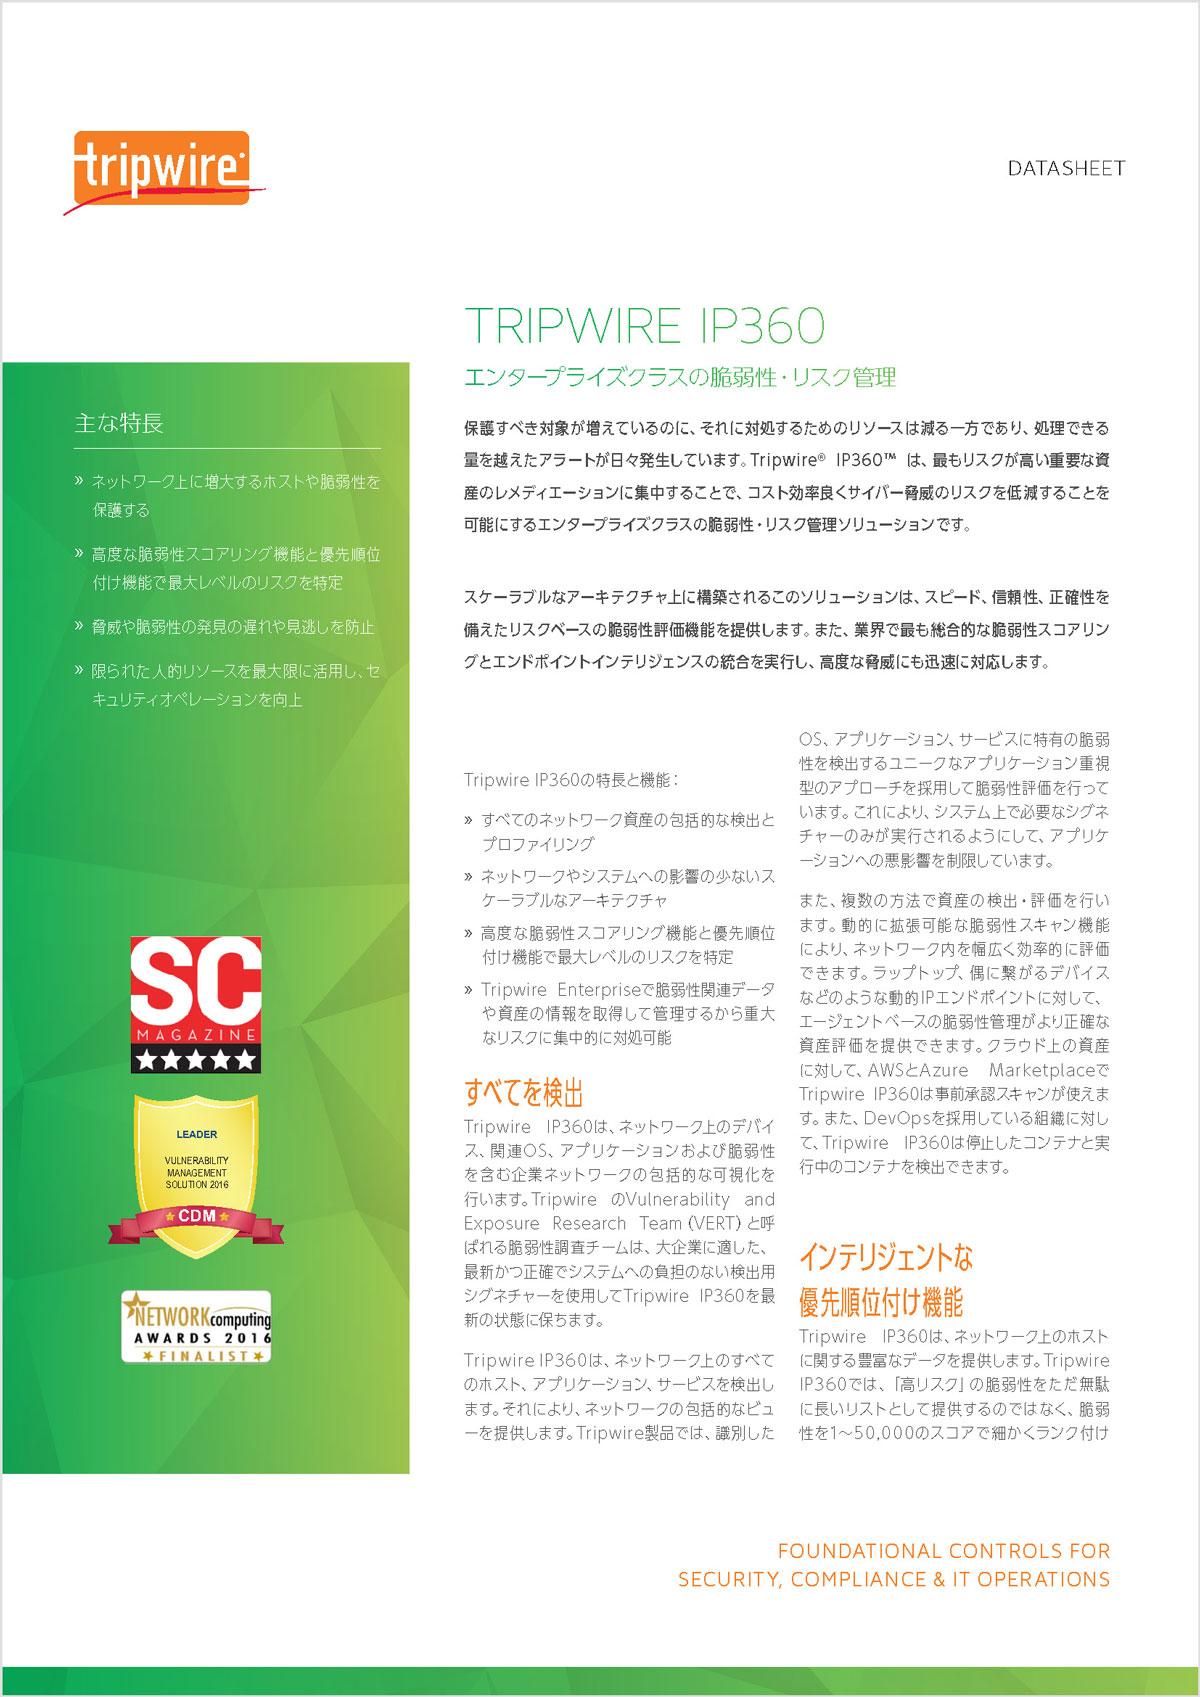 TRIPWIRE IP360 データシート